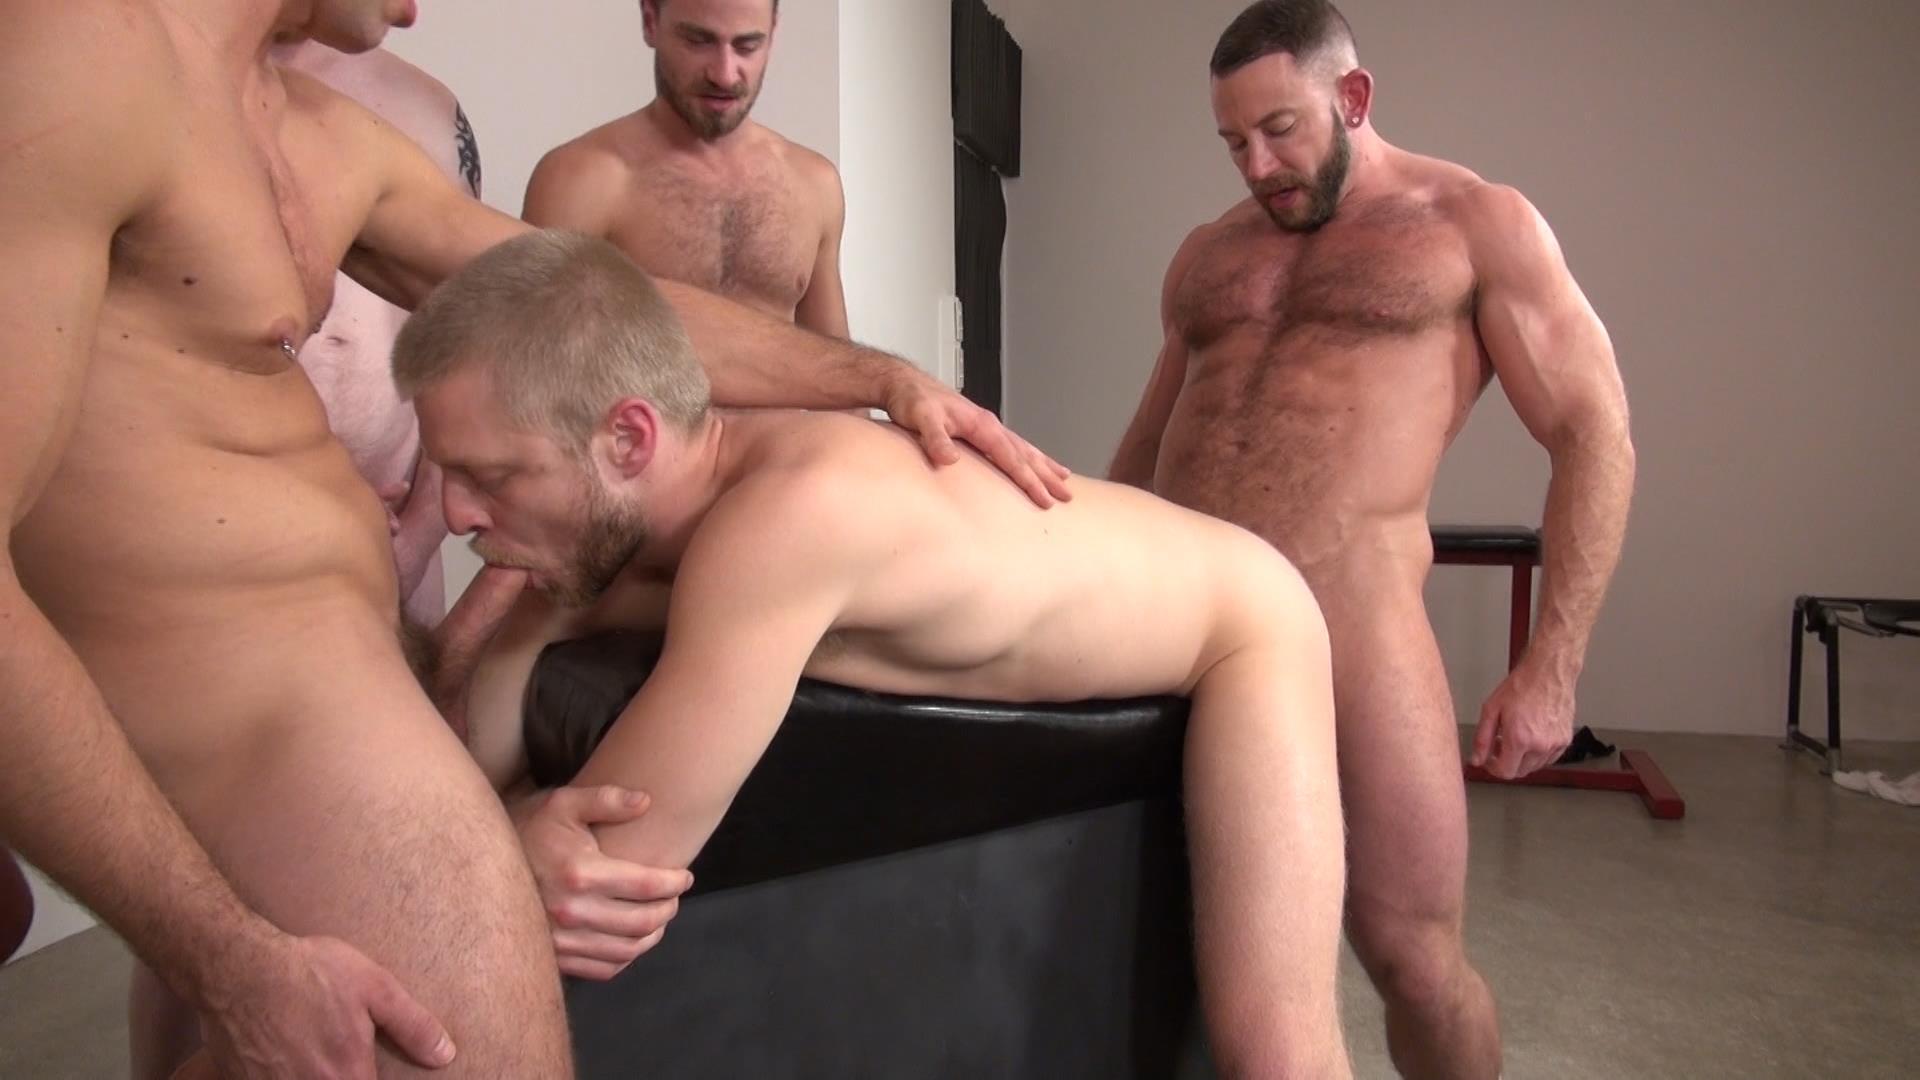 Sex orgies with large cocks